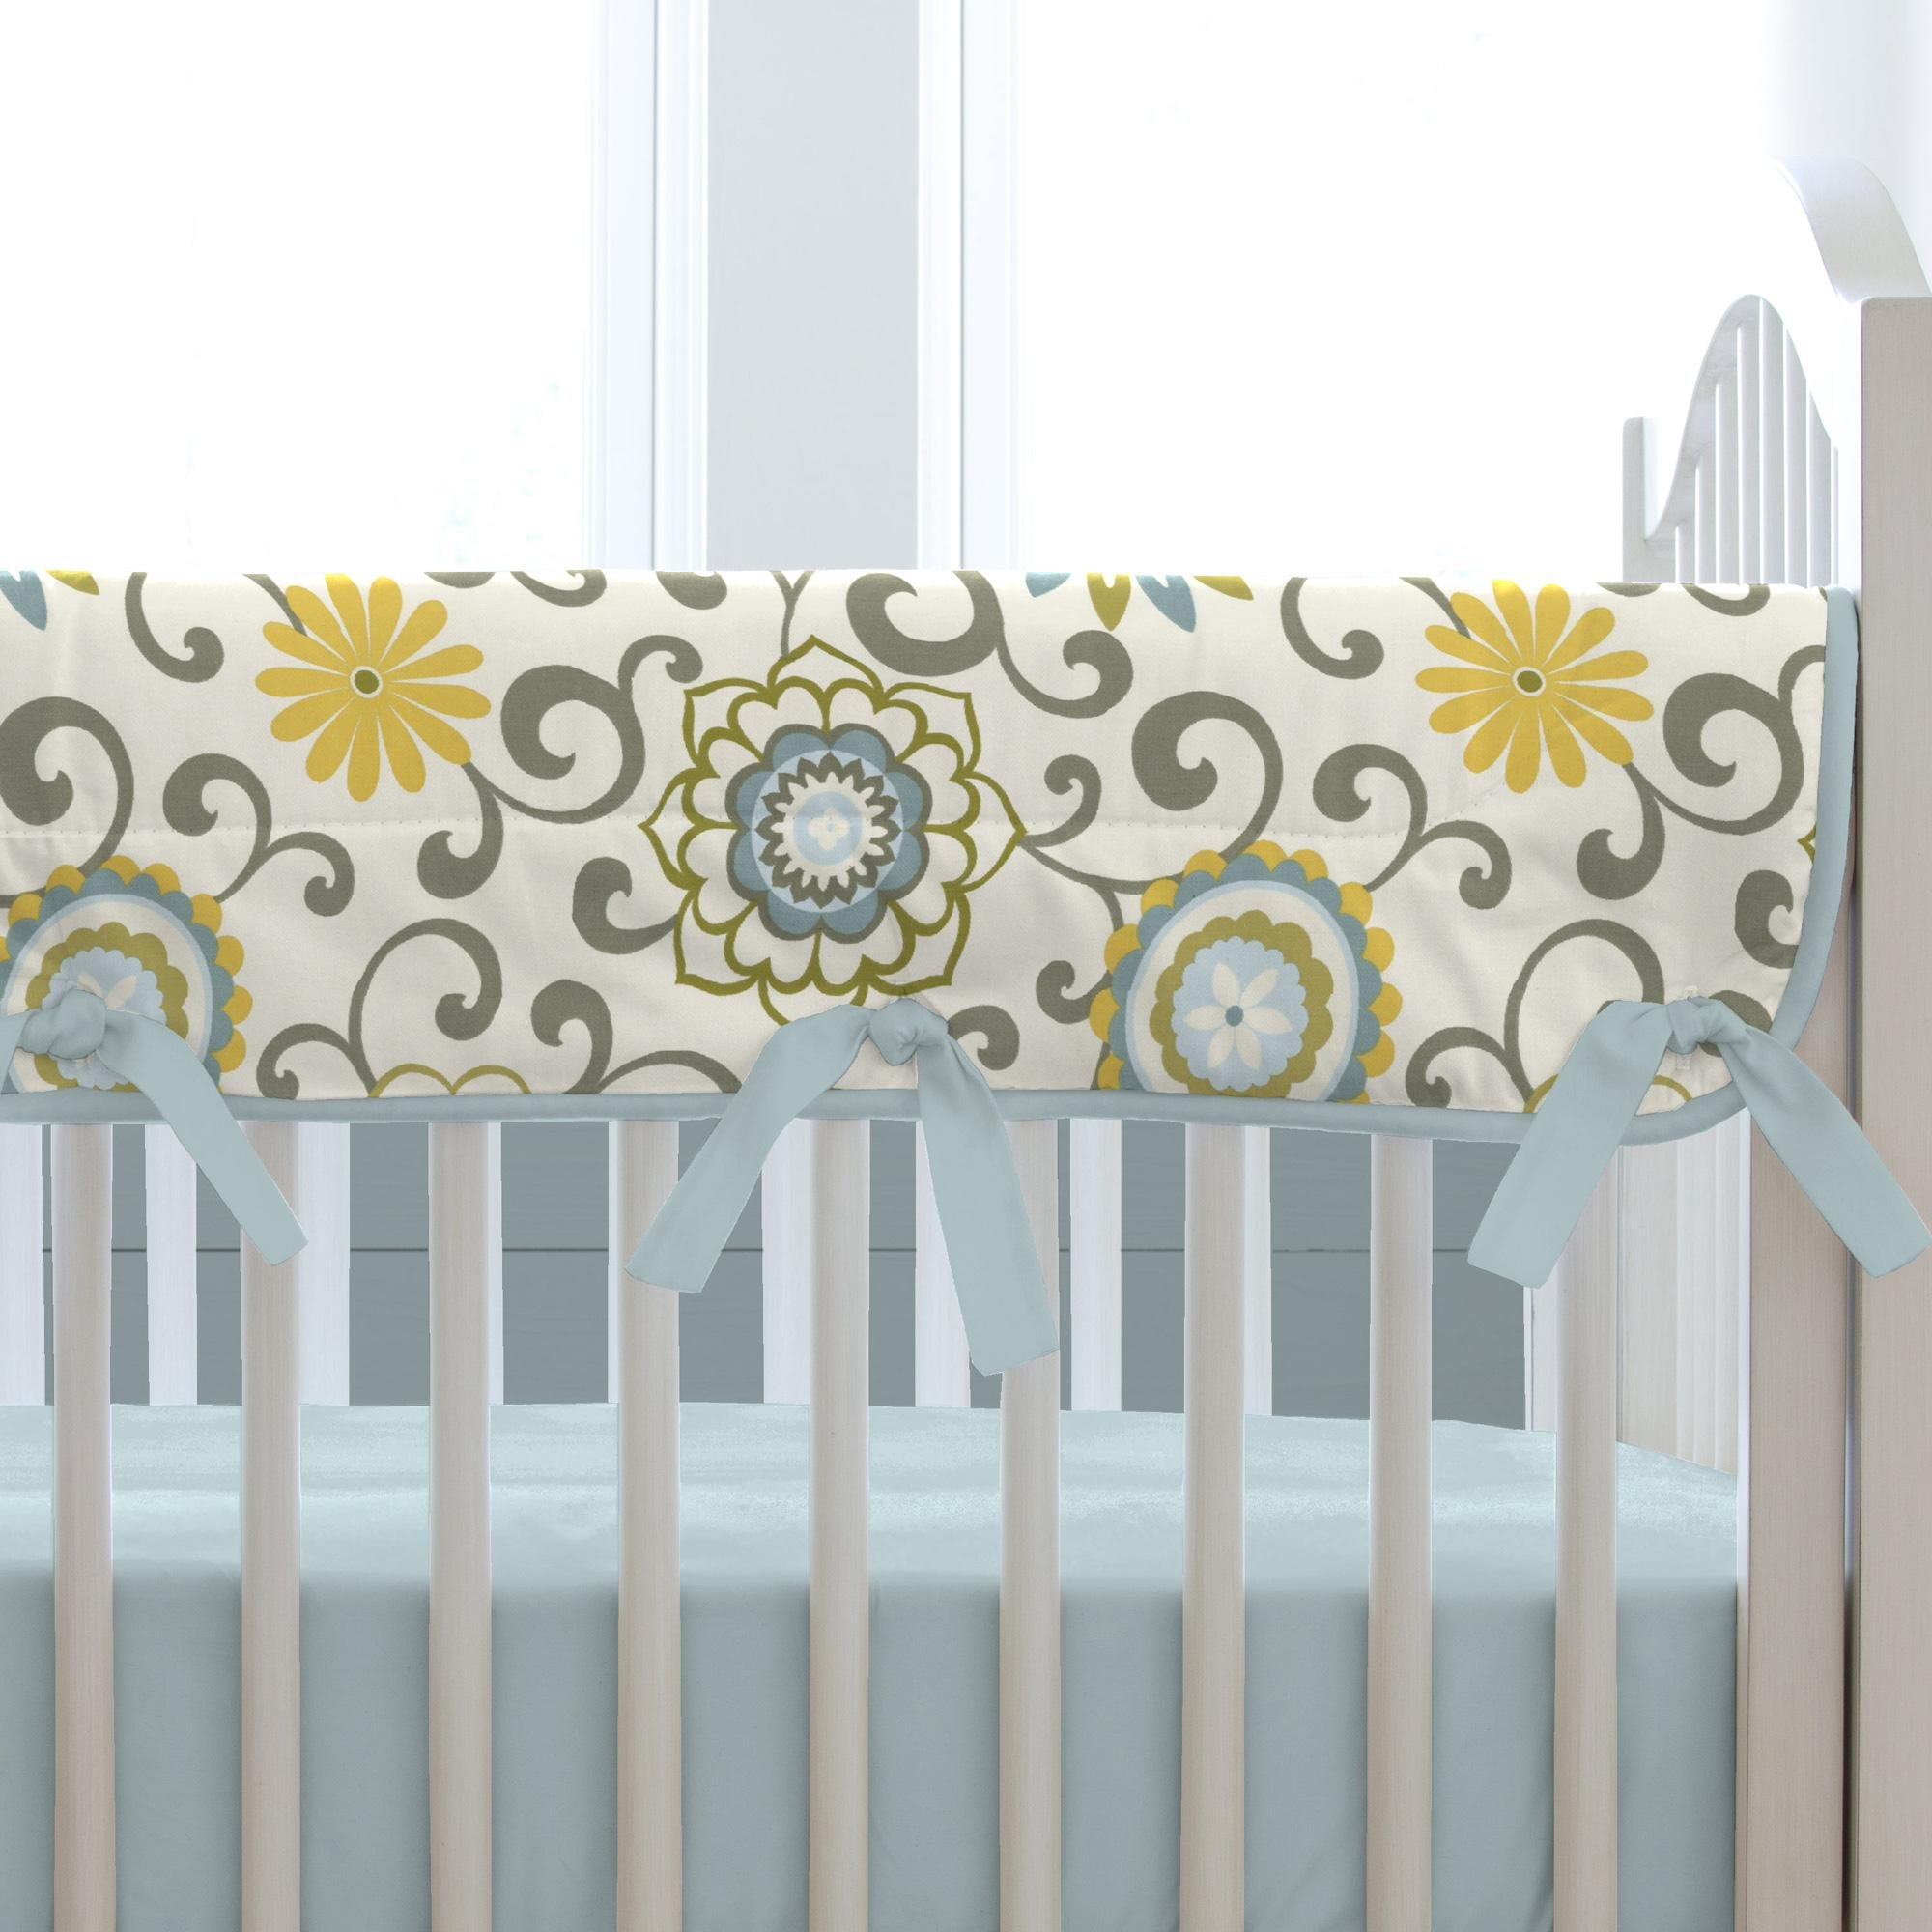 Carousel Designs Spa Pom Pon Play Crib Rail Cover